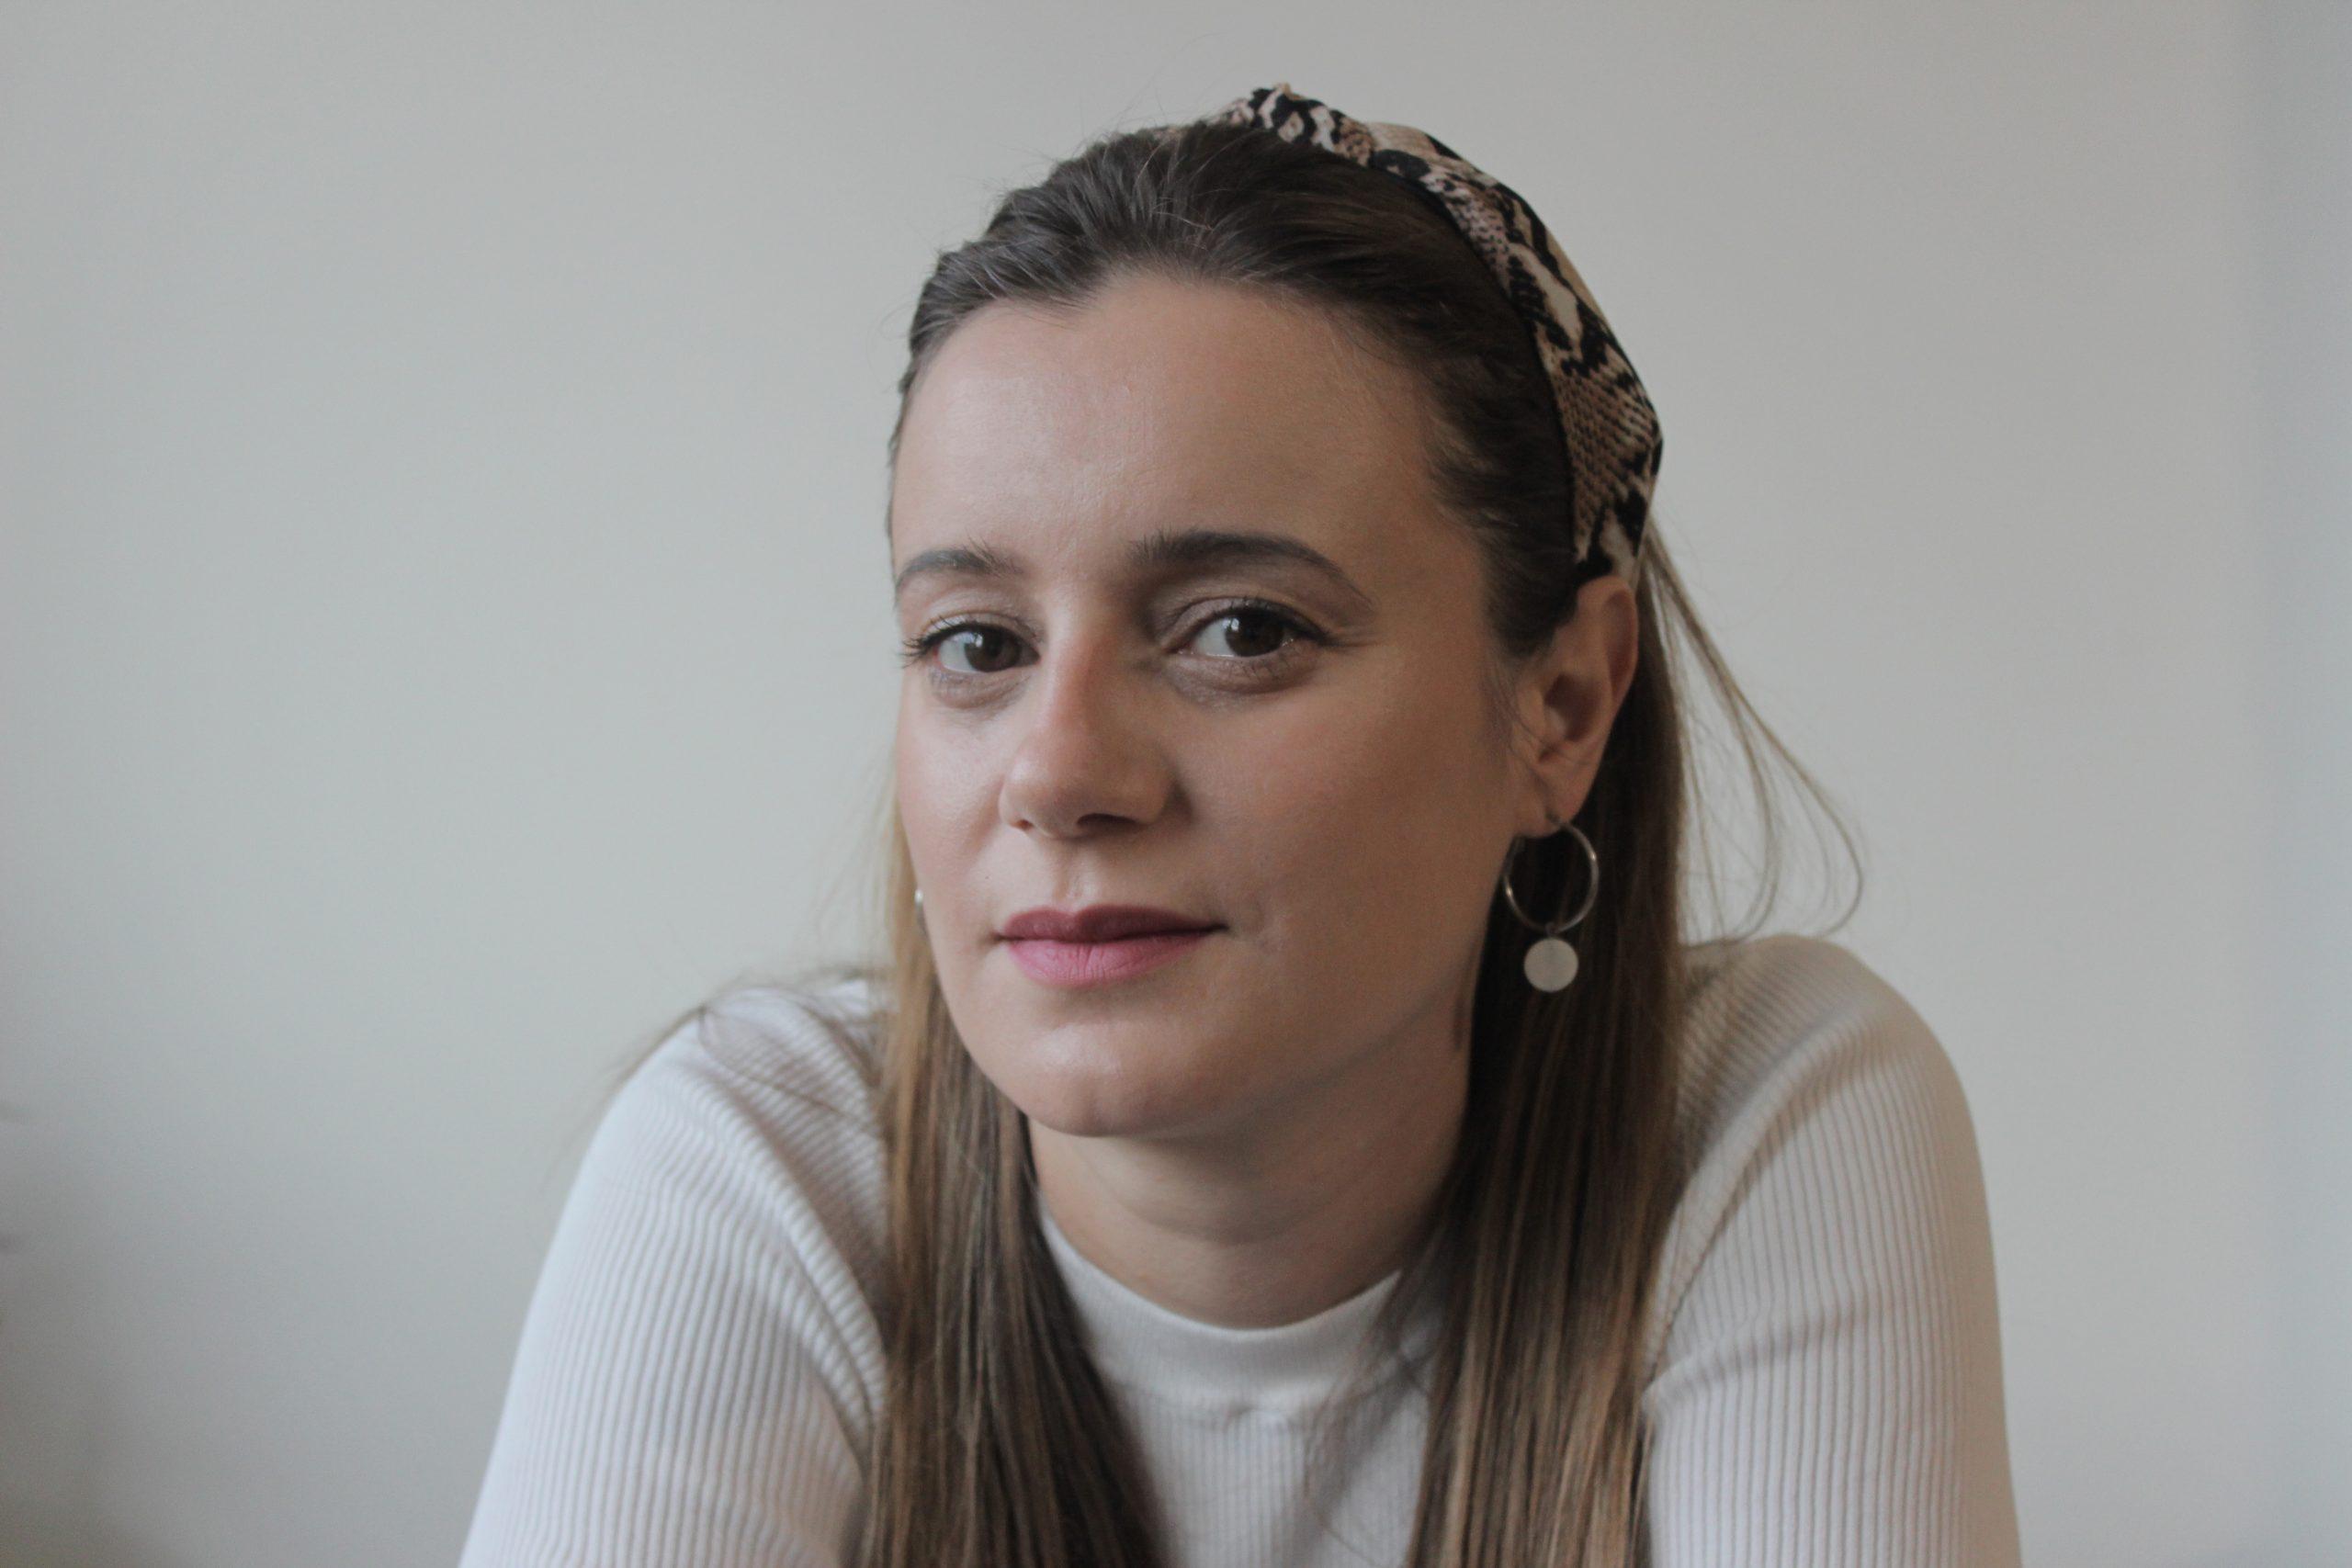 Meri Sekulovska